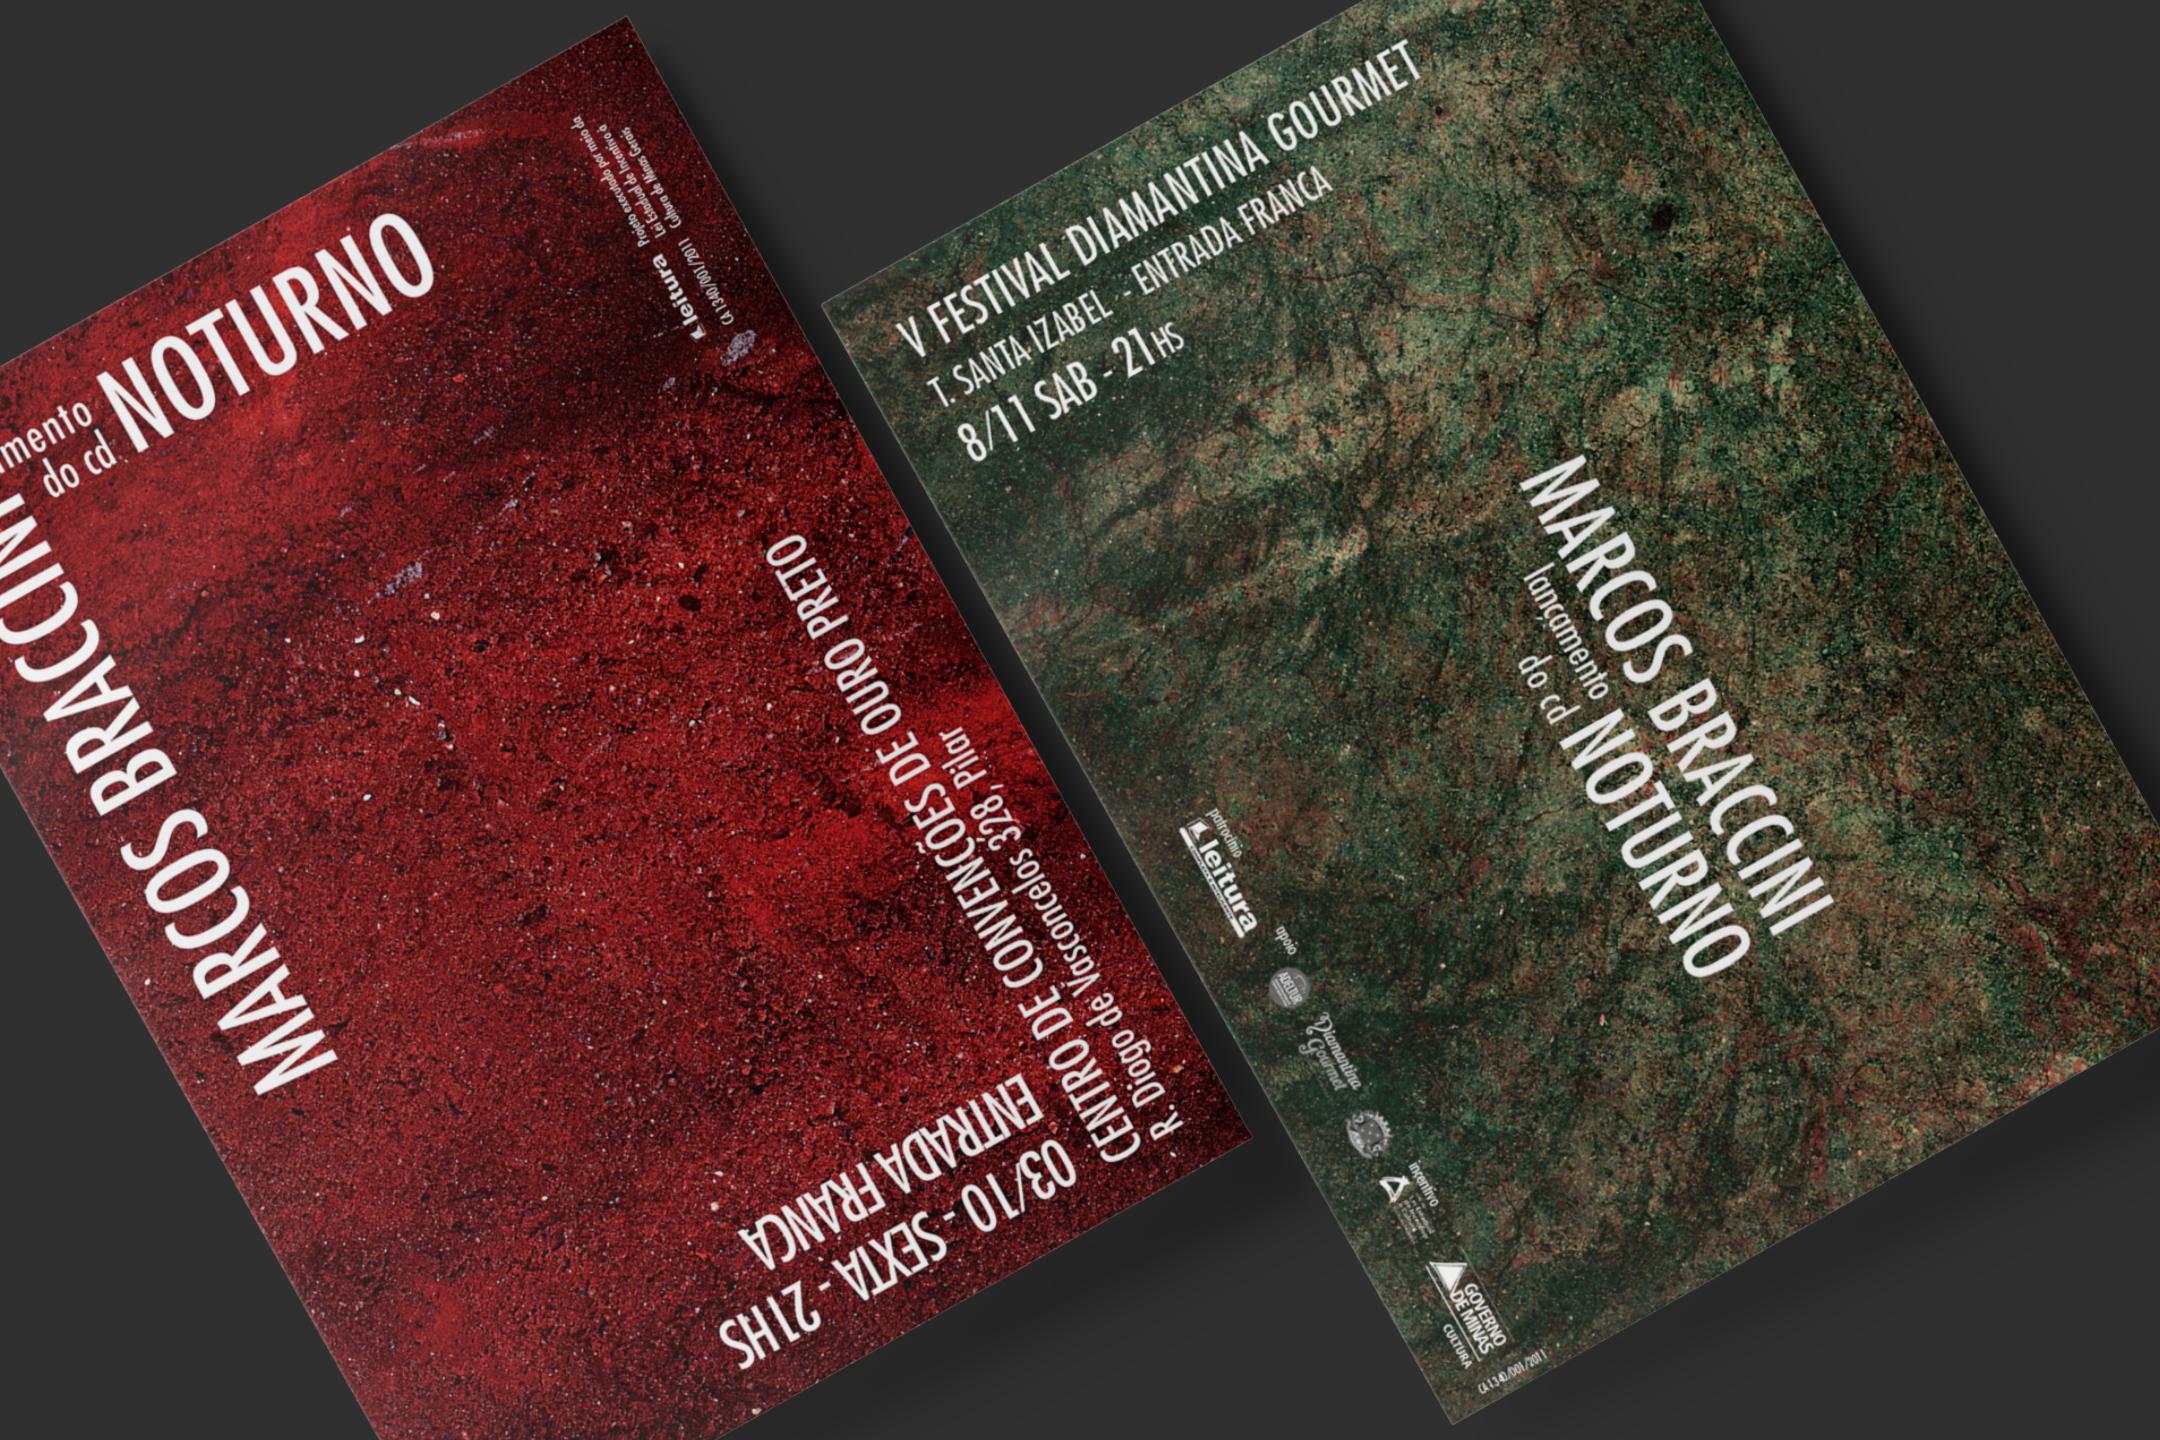 Noturno-Poster-Series-6